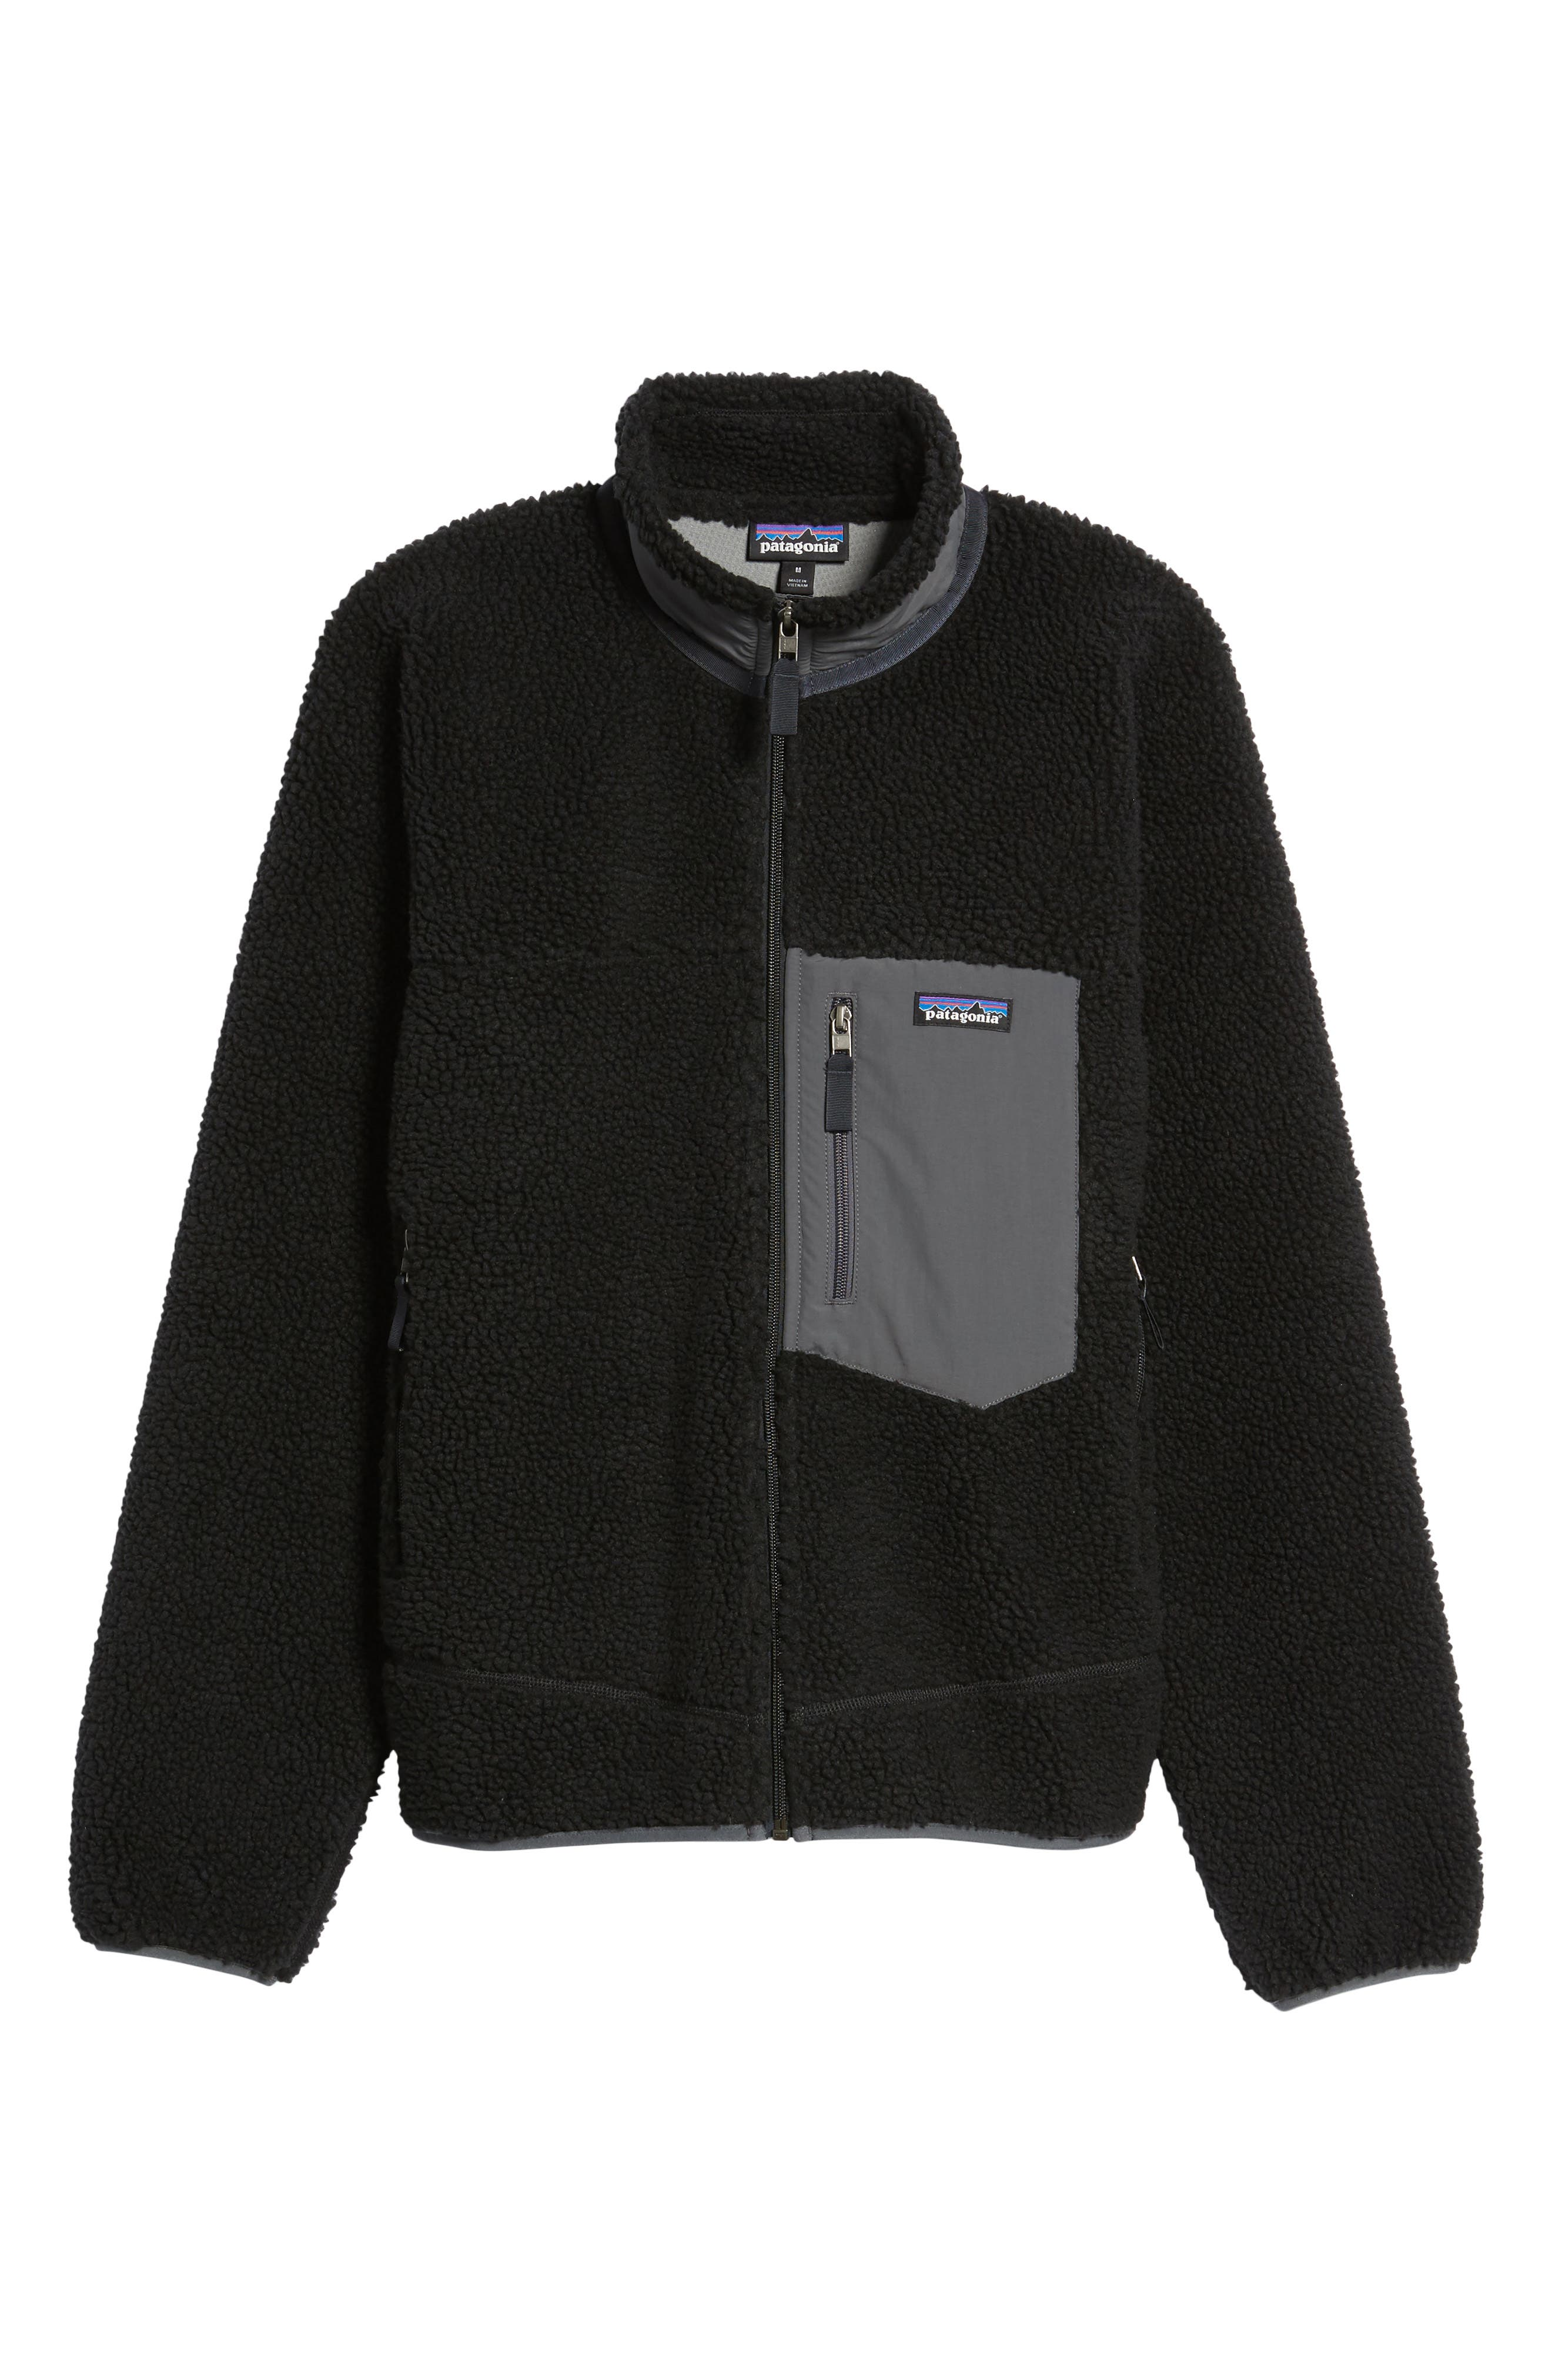 Retro-X Fleece Jacket,                             Alternate thumbnail 5, color,                             002